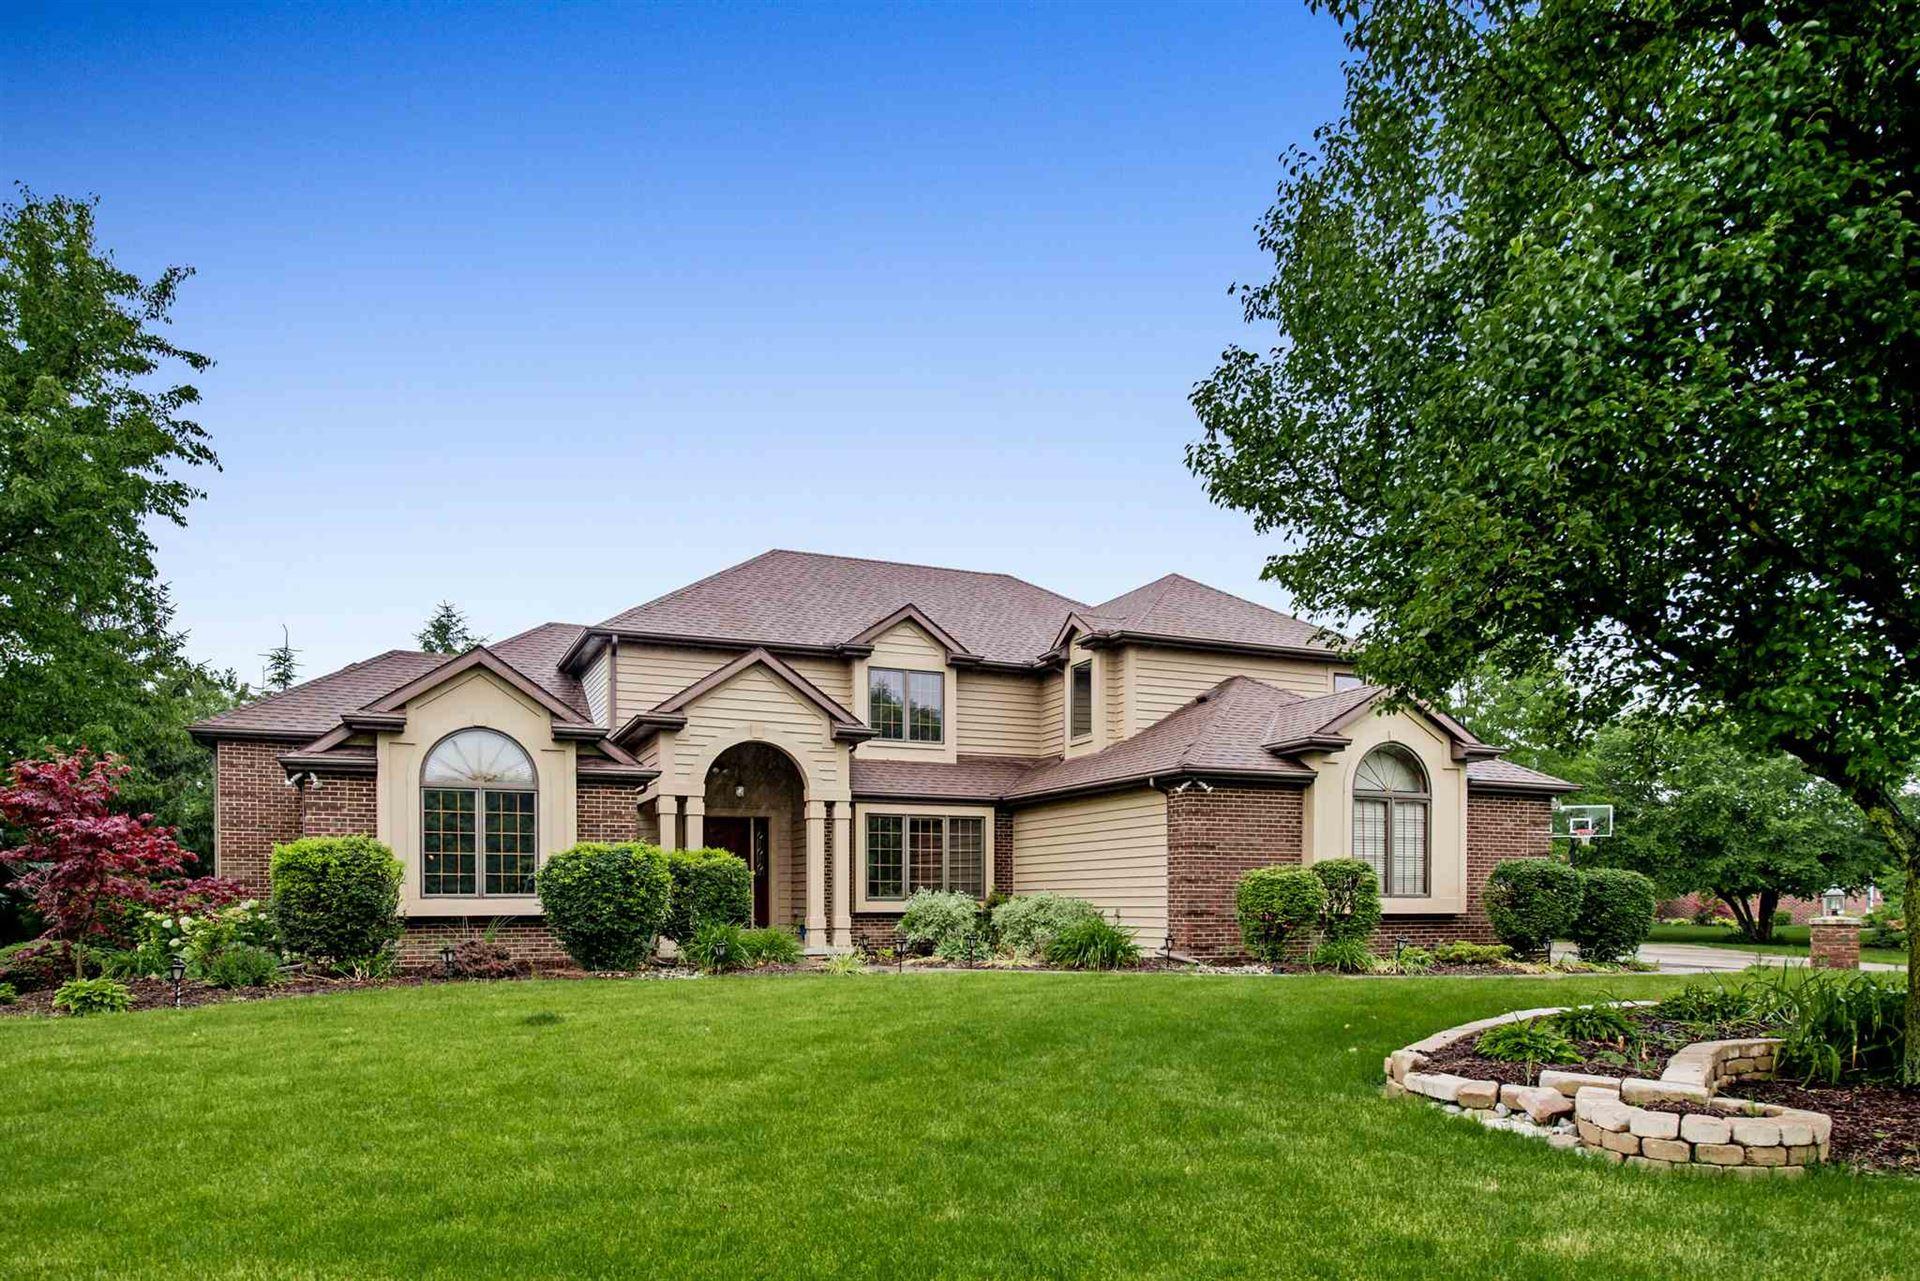 4634 Wyndemere Lane, Fort Wayne, IN 46835 - #: 202015519